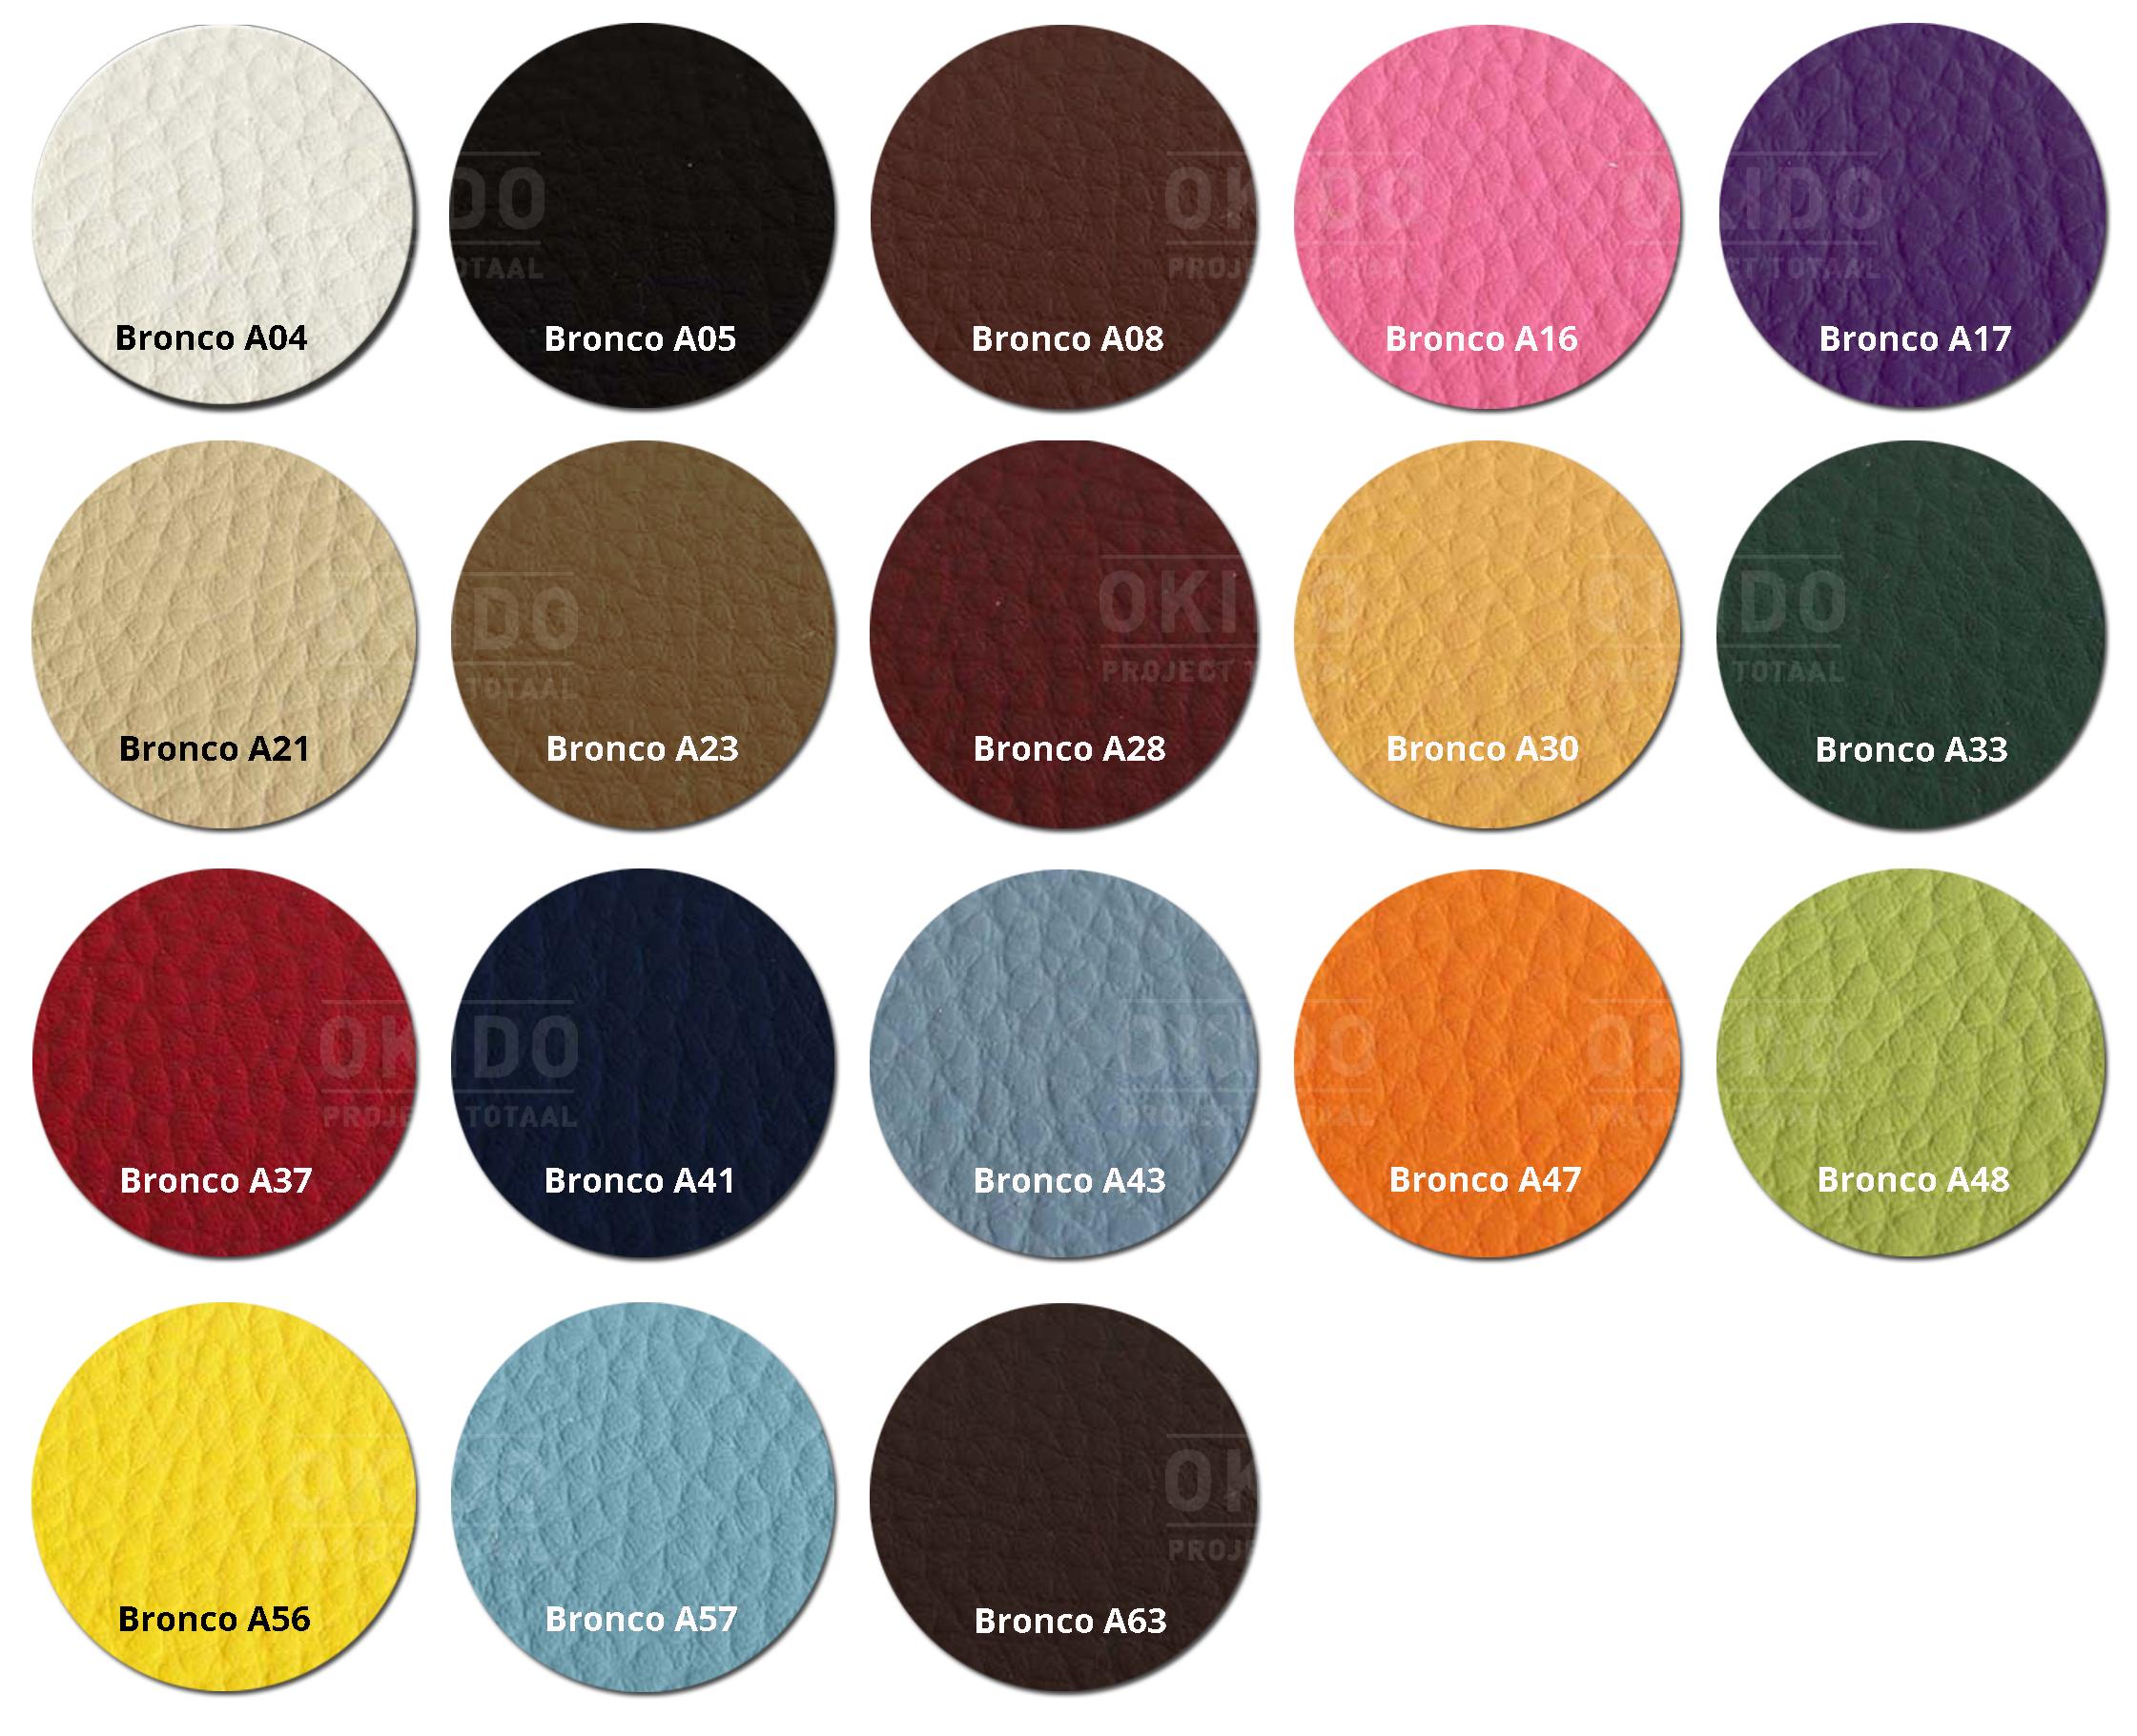 Bronco kleurrondjes met logo HOOFDFOTO - Barkruk Jarno Bronco bordeaux